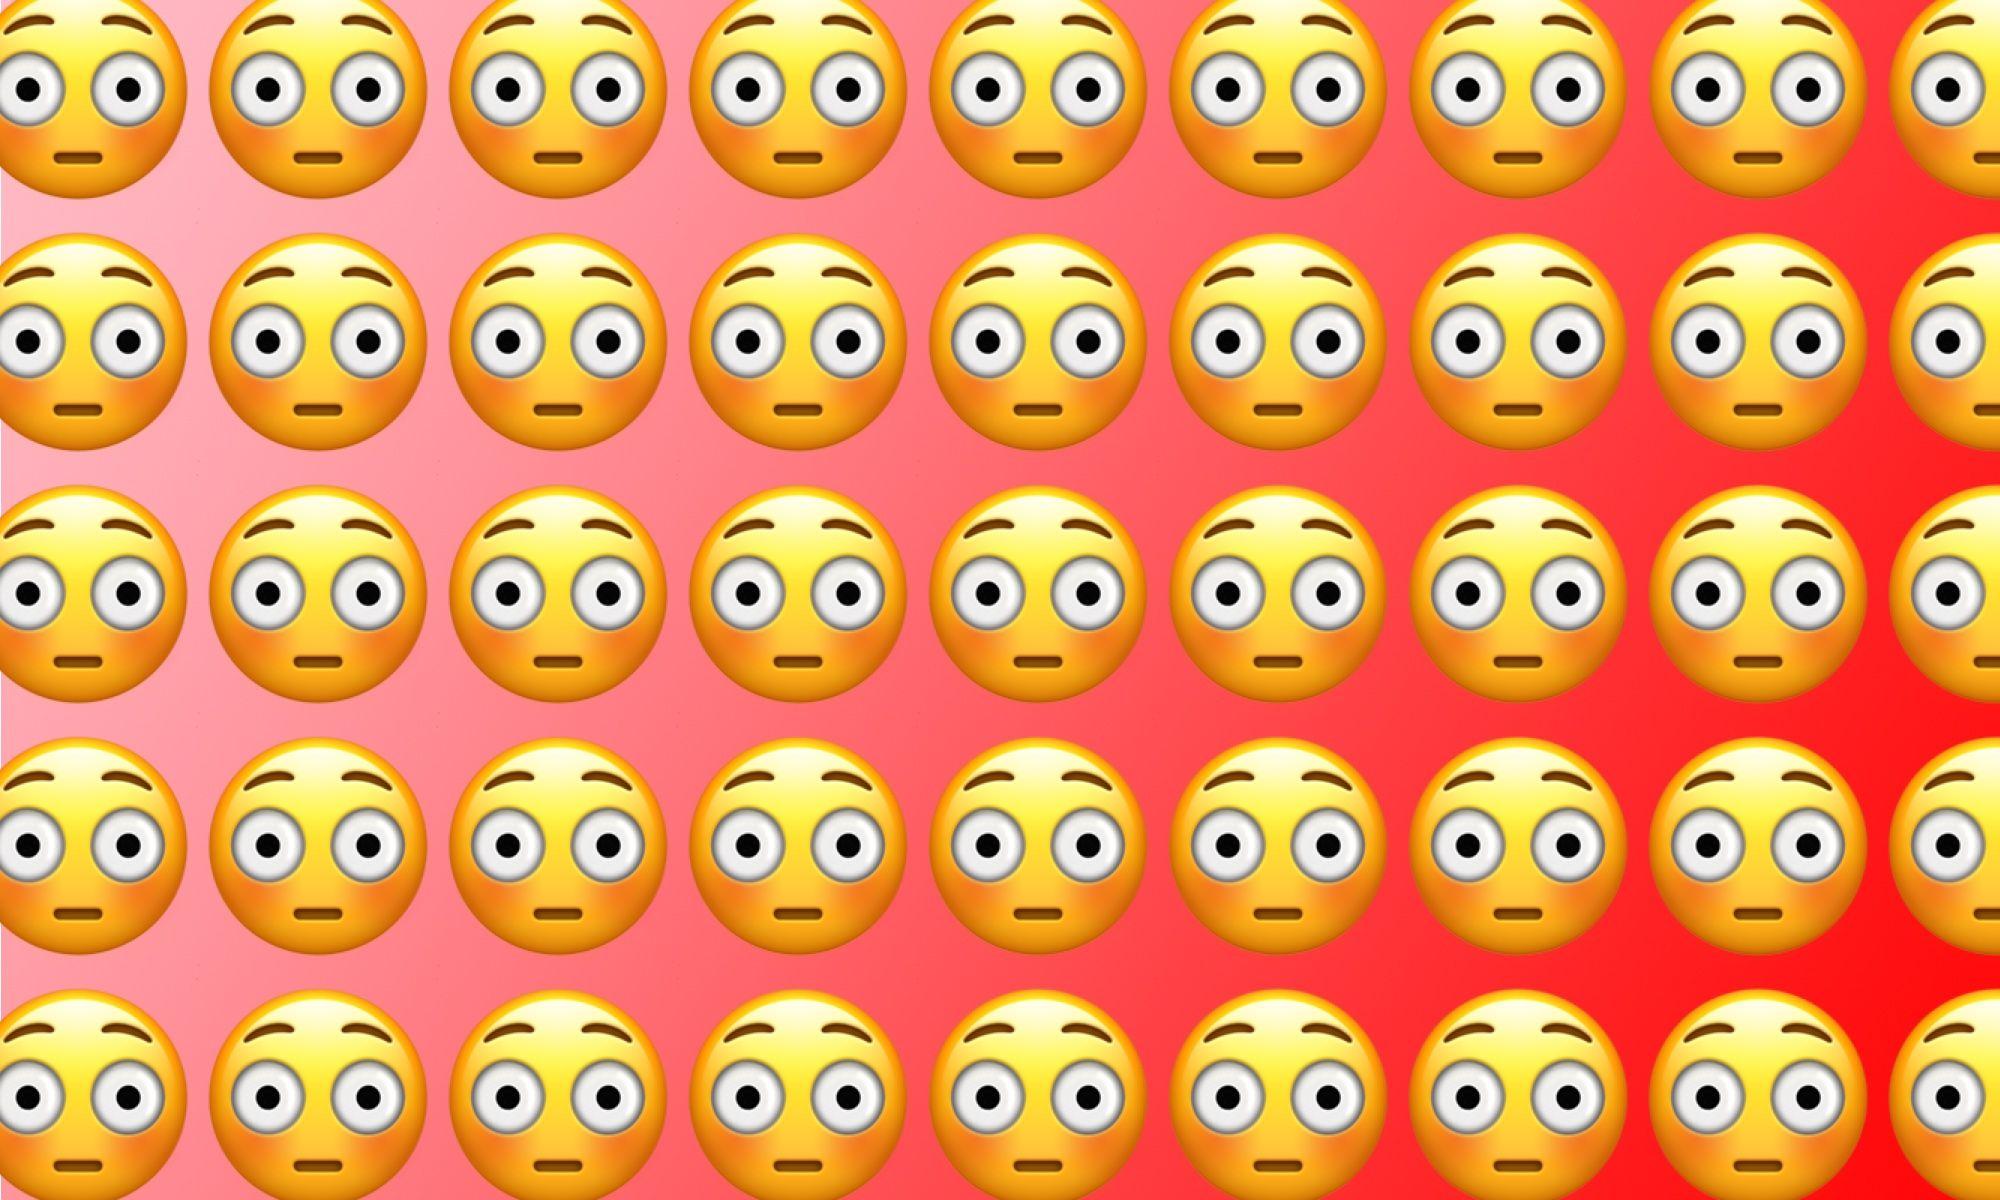 Emoji Oop Meme Sticker Shy Wow Dissapointed Oop Hand Over